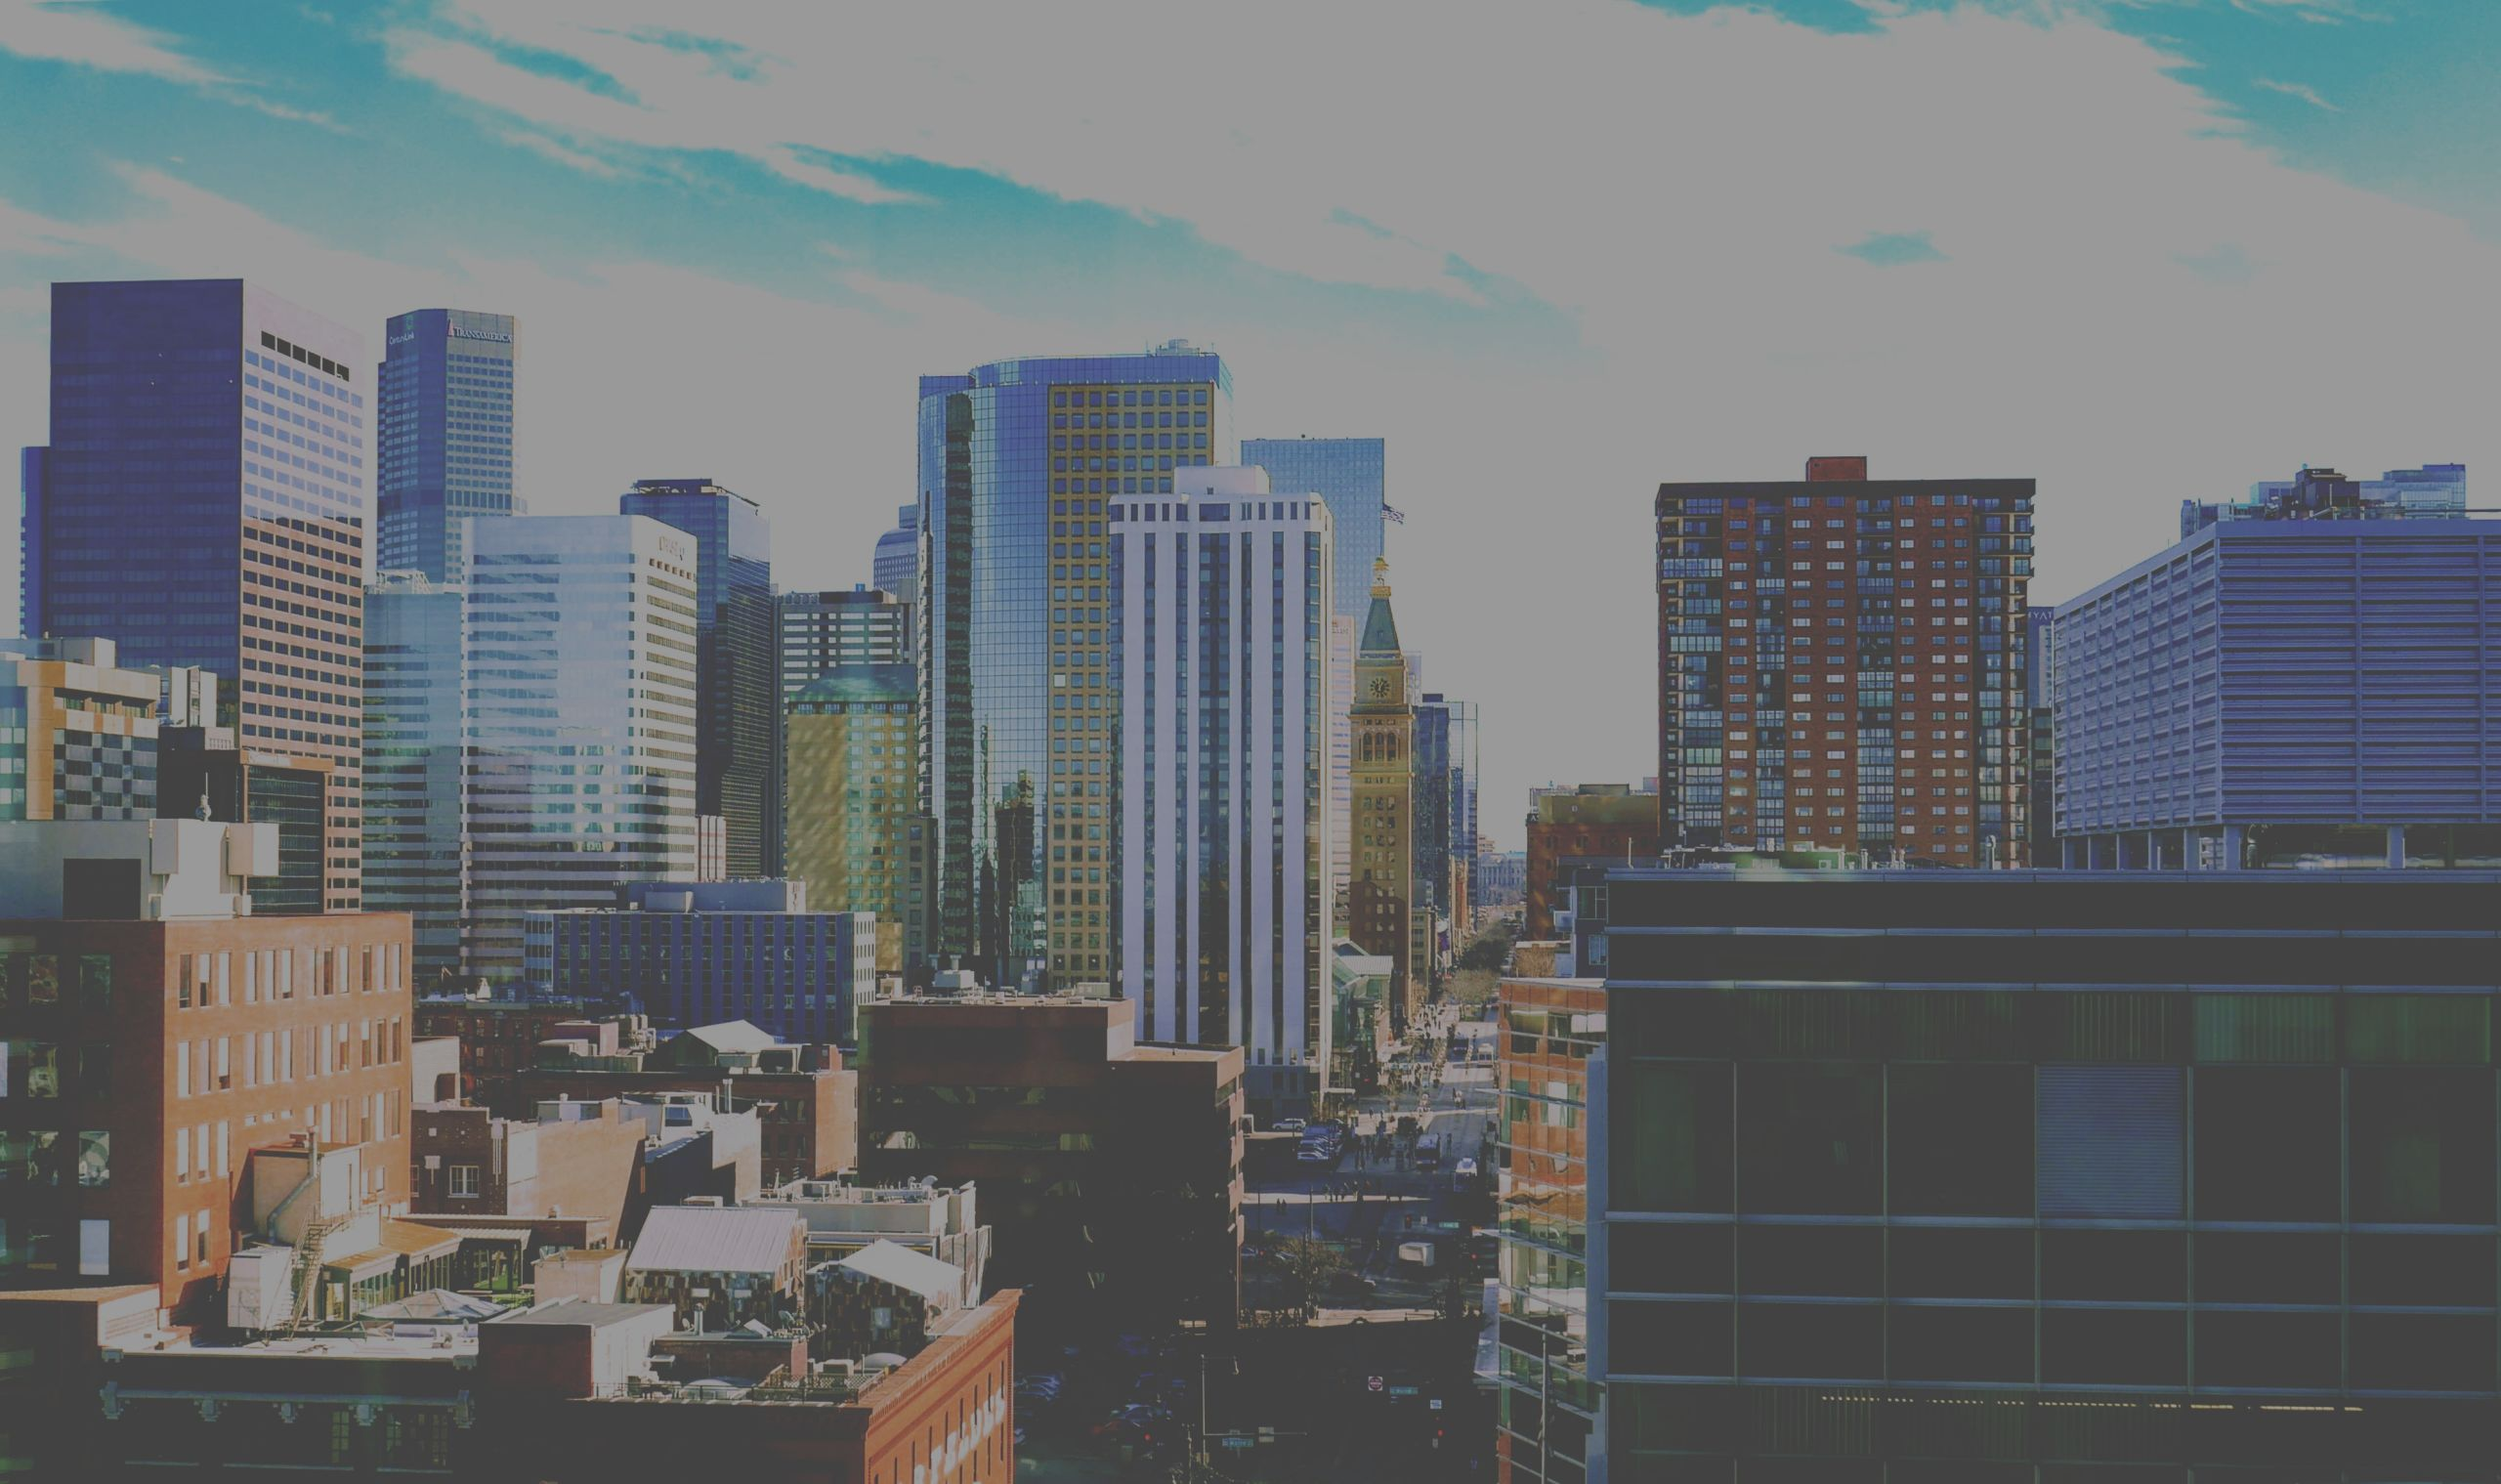 Denver Commercial Real Estate Sales Remain Strong